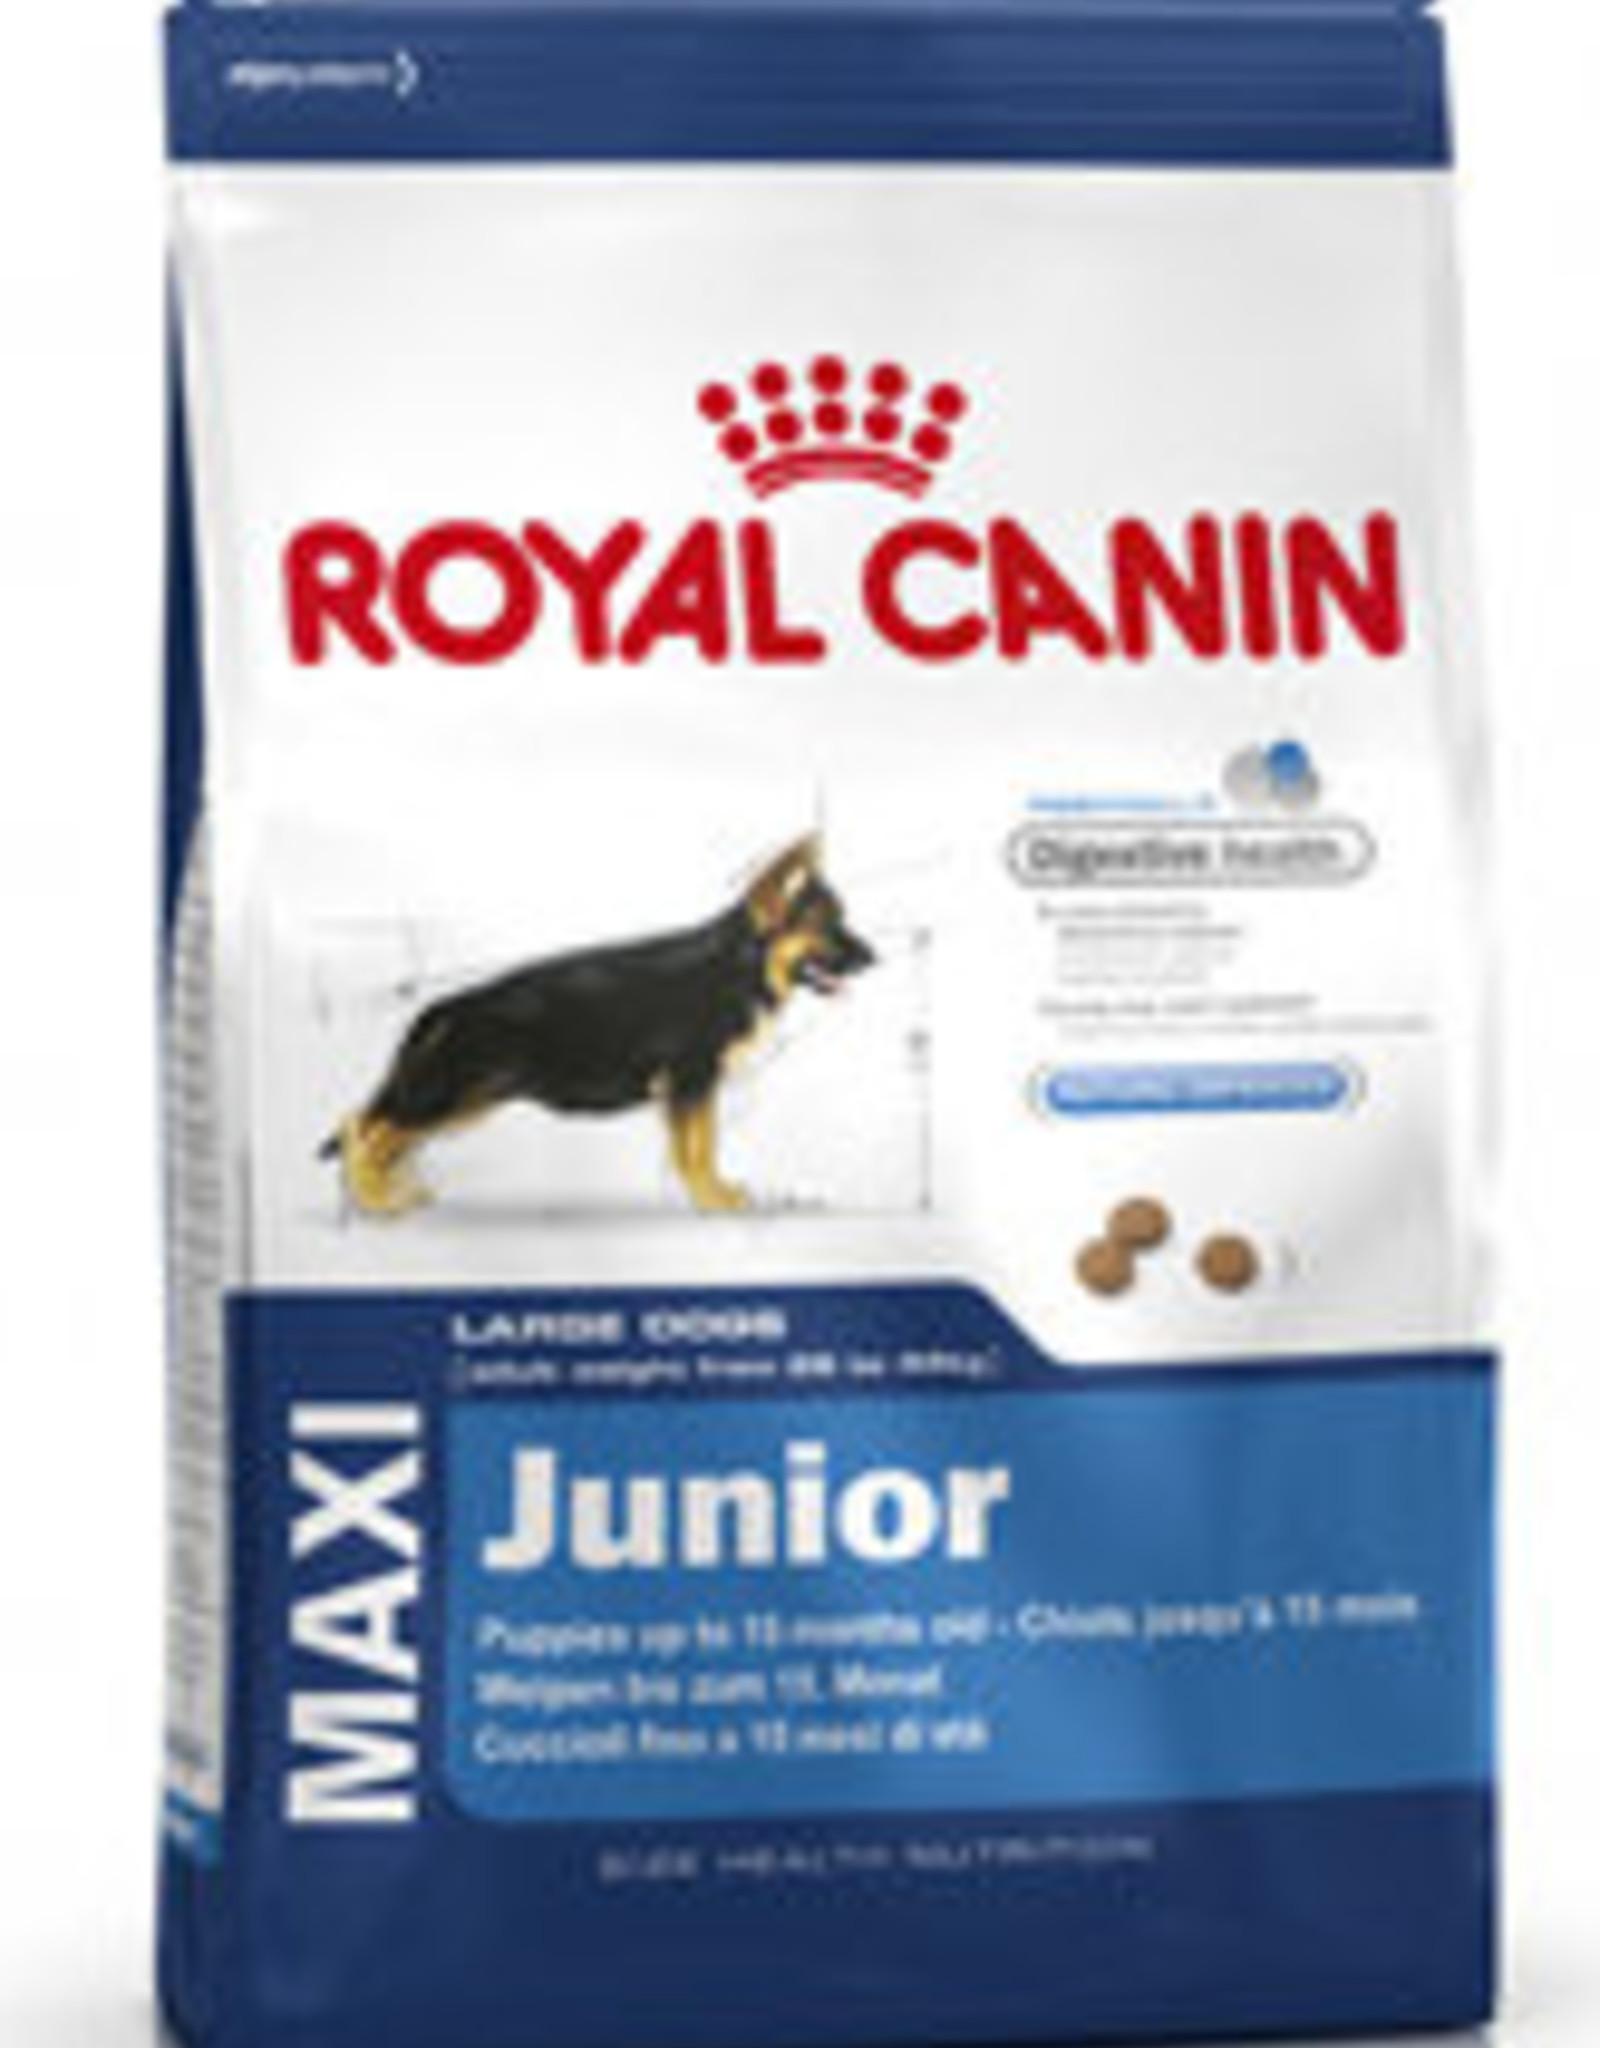 Royal Canin Royal Canin Shn Maxi Junior Hond 4kg